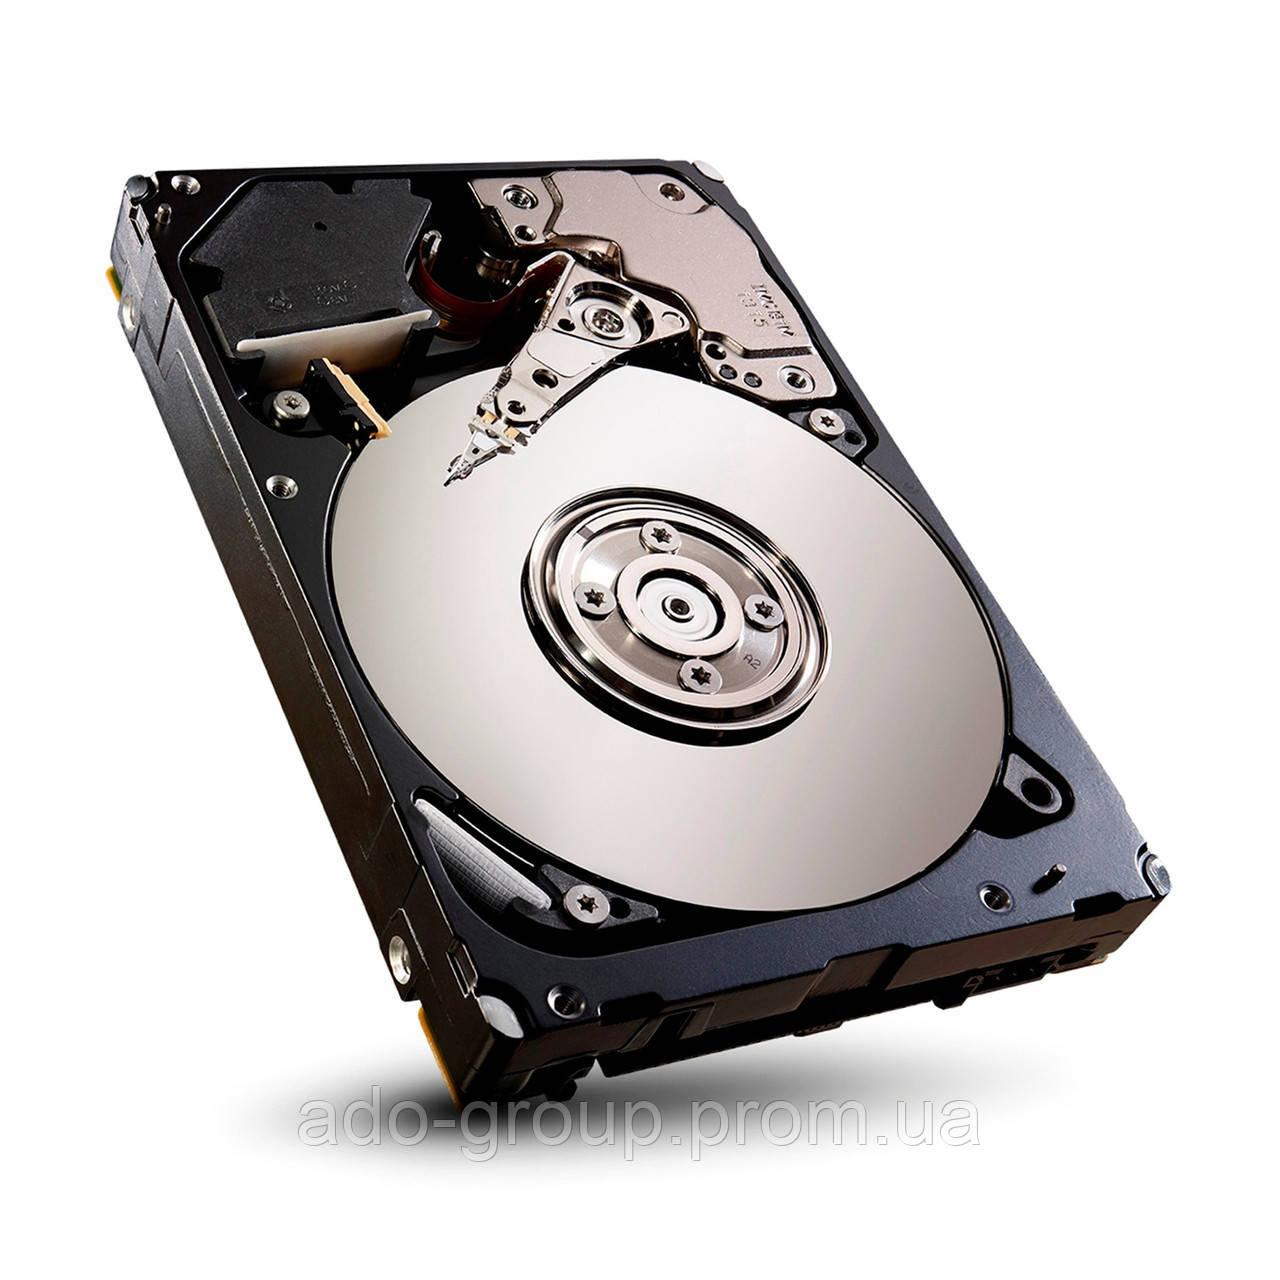 "342-5521 Жесткий диск Dell 1200GB SAS 10K  2.5"" +"